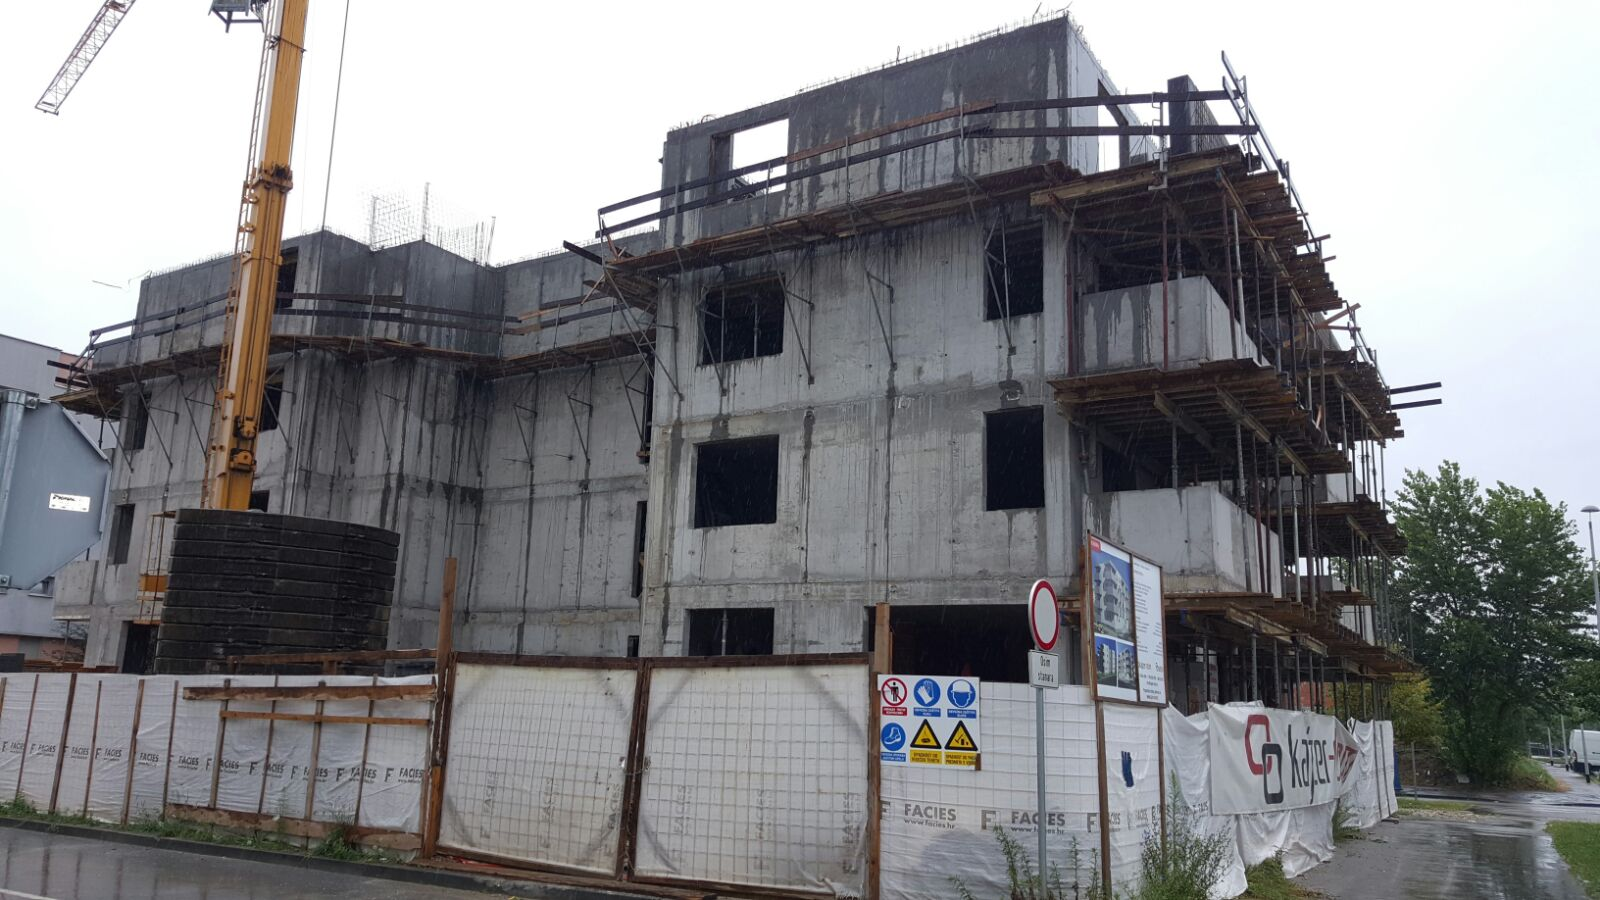 NEW CONSTRUCTION OF APARTMENT BUILDINGS – ZAGREB (CROATIA)